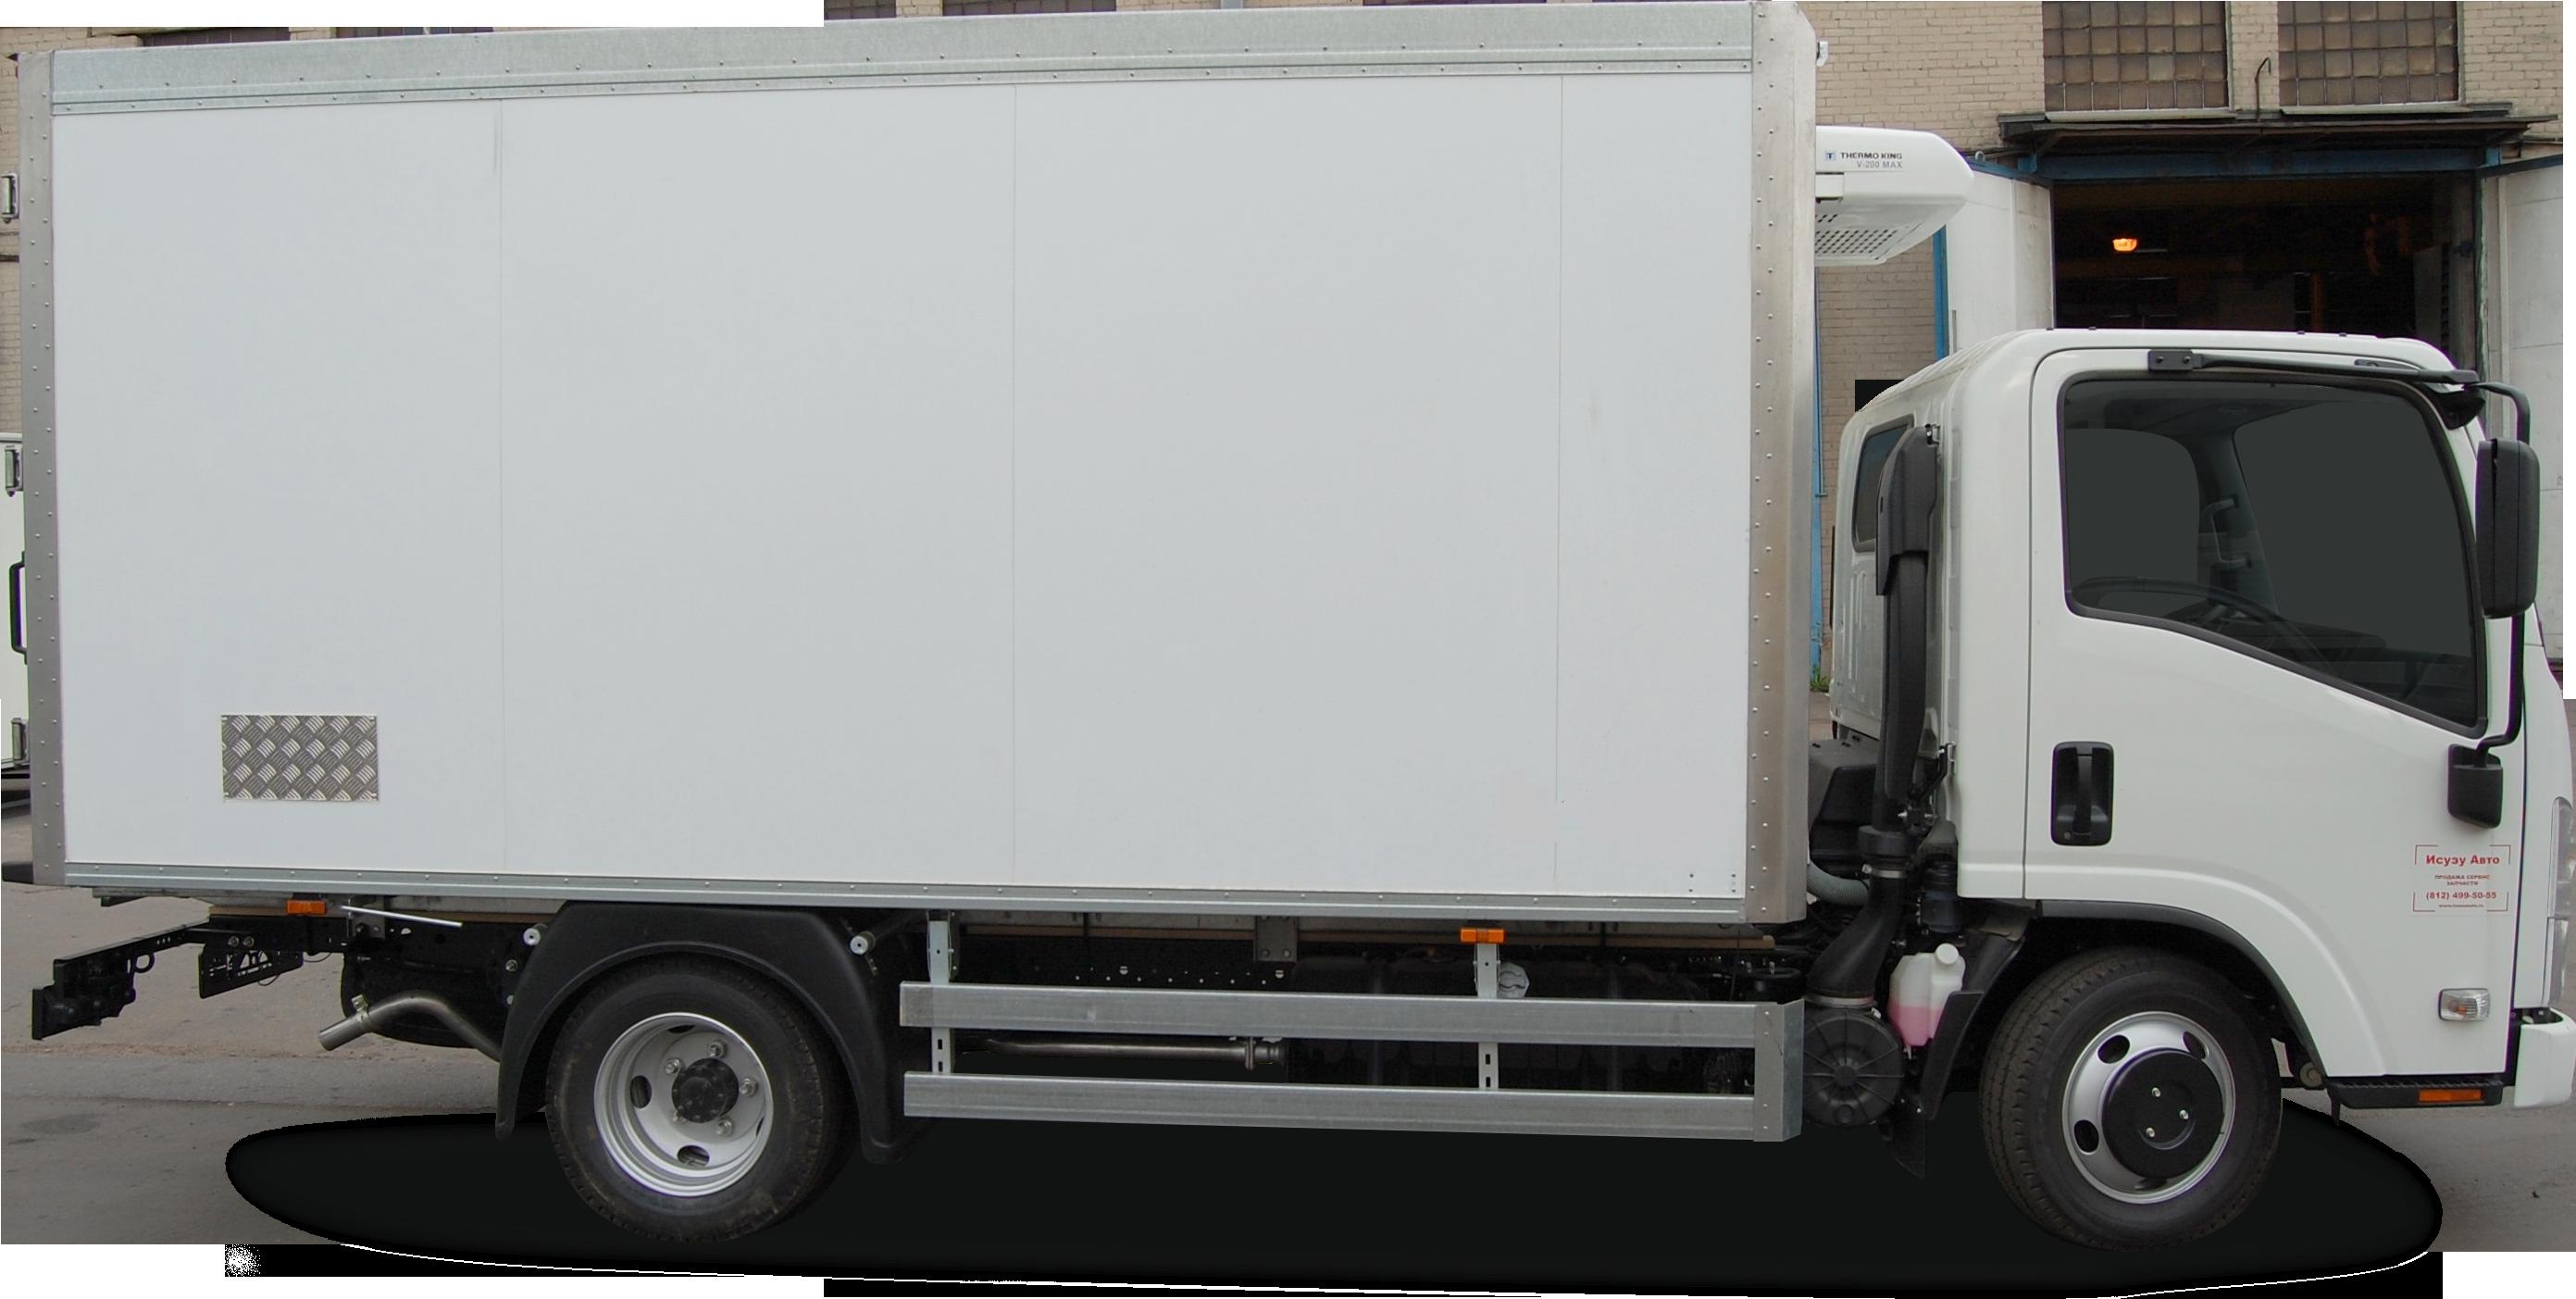 Truck PNG Images Transparent Free Download.